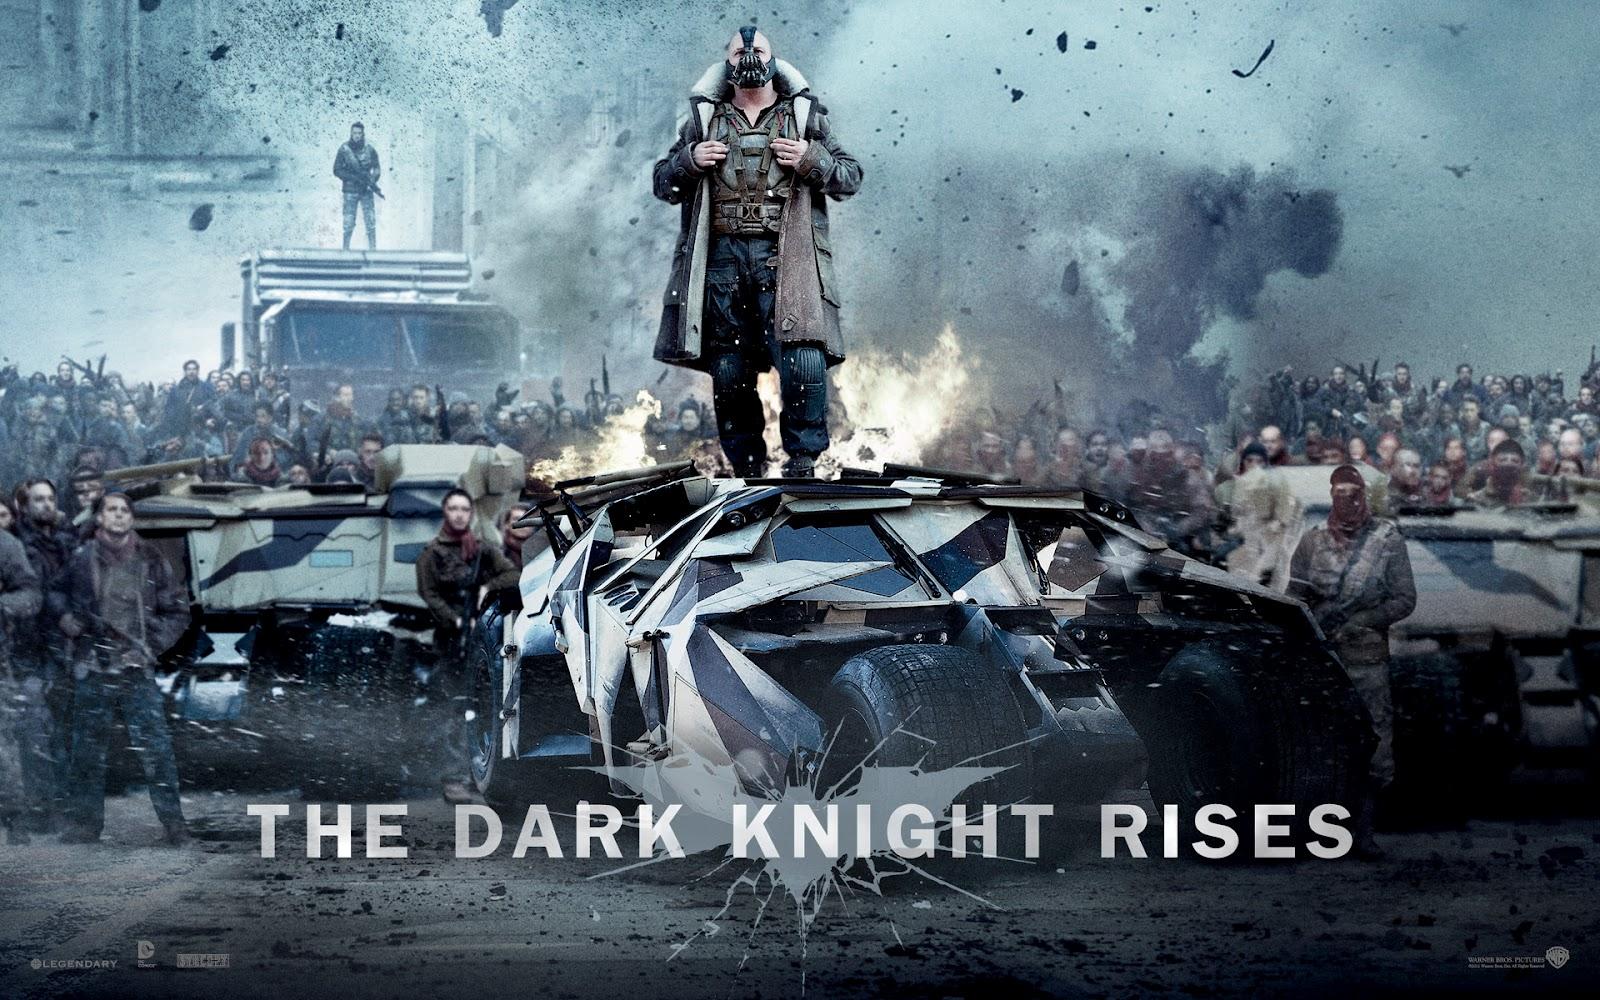 http://4.bp.blogspot.com/-o2WCPHIfFIY/UATES1A95mI/AAAAAAAAK8k/8fP7EtXuEV0/s1600/Wallpapers+The+Dark+Knight+Rises,+Images+%2810%29.jpg